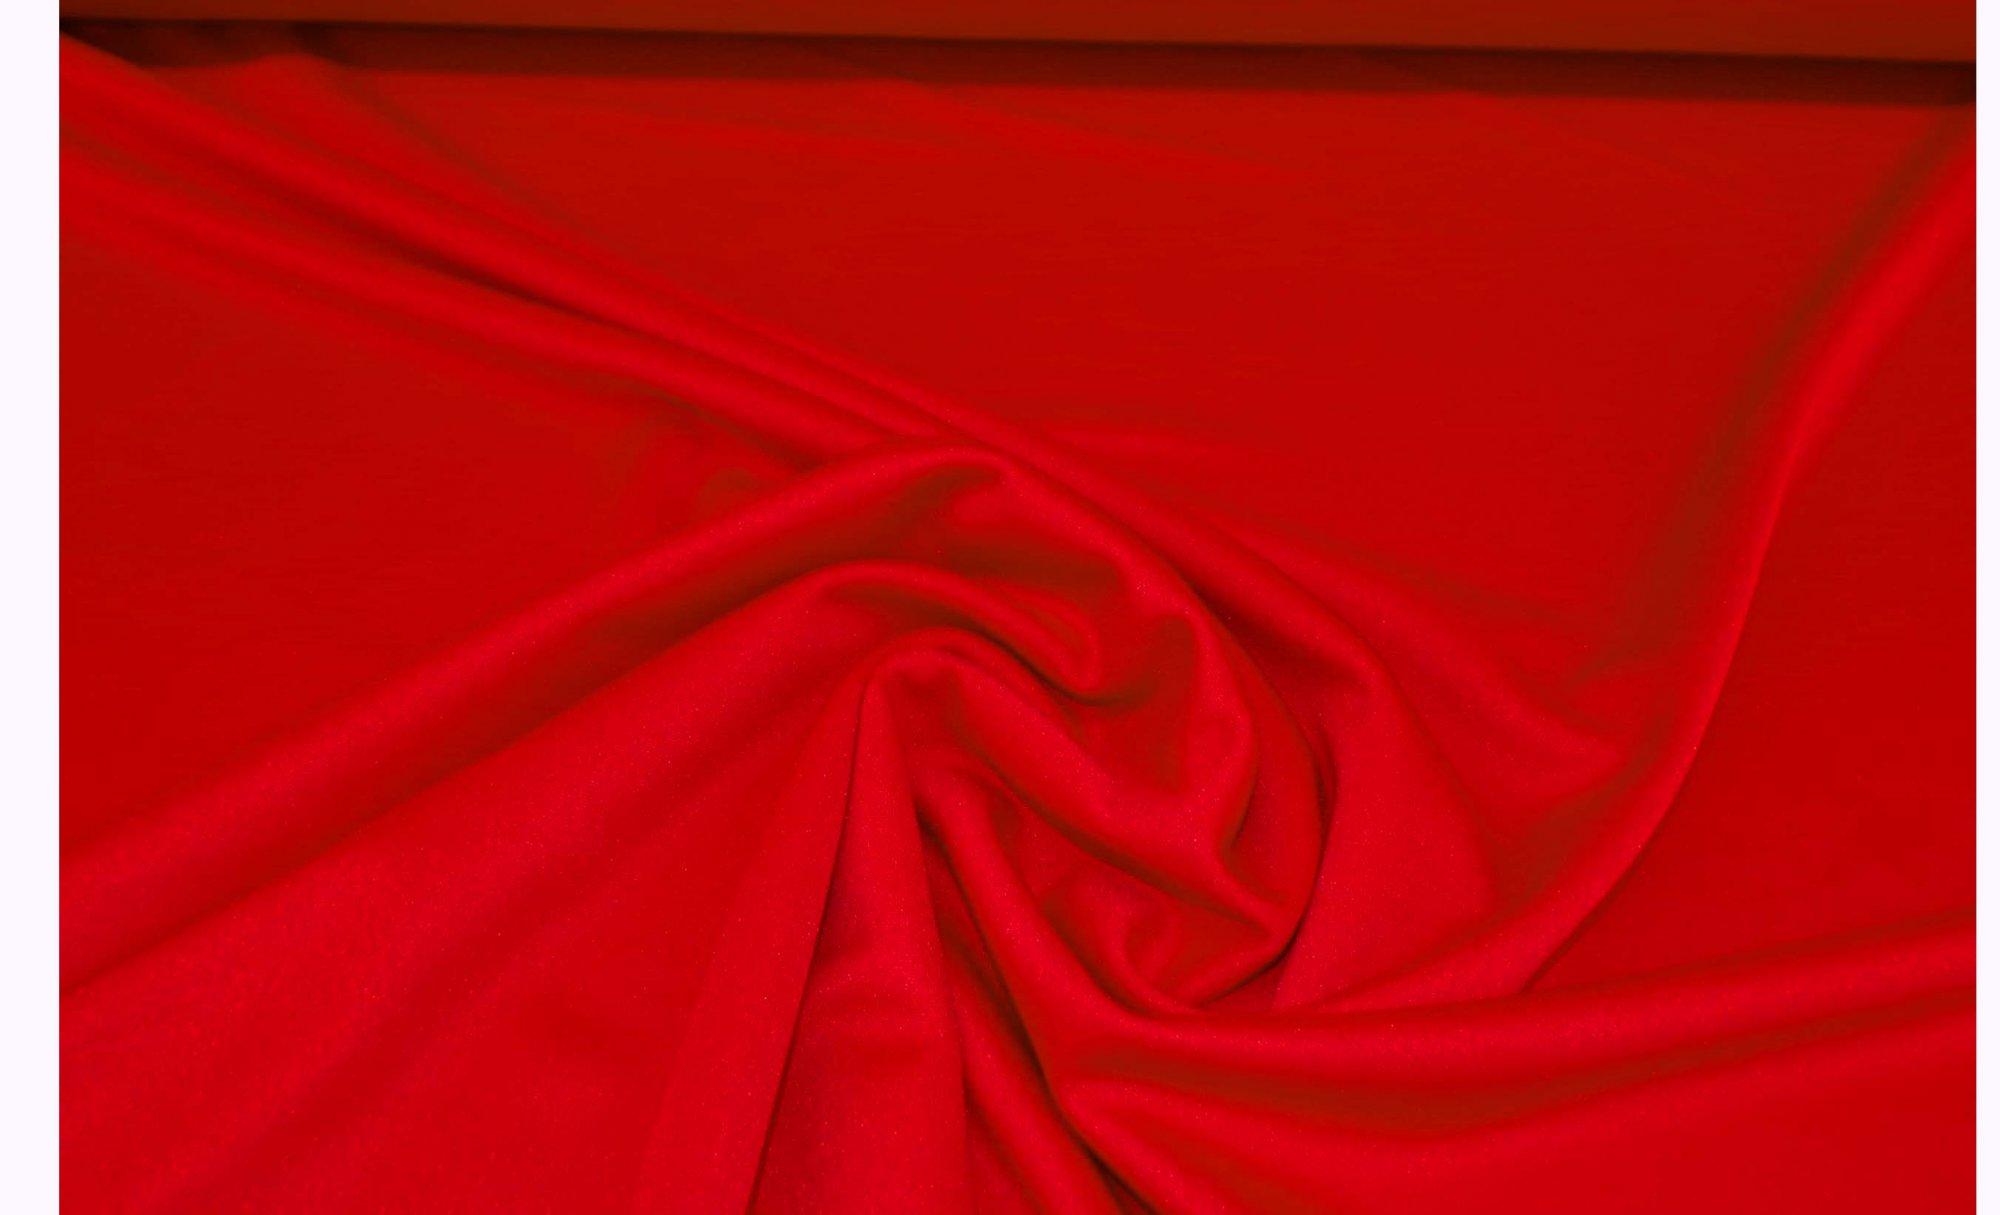 Red Ponte (Scuba) Knit - 8 oz - 58in